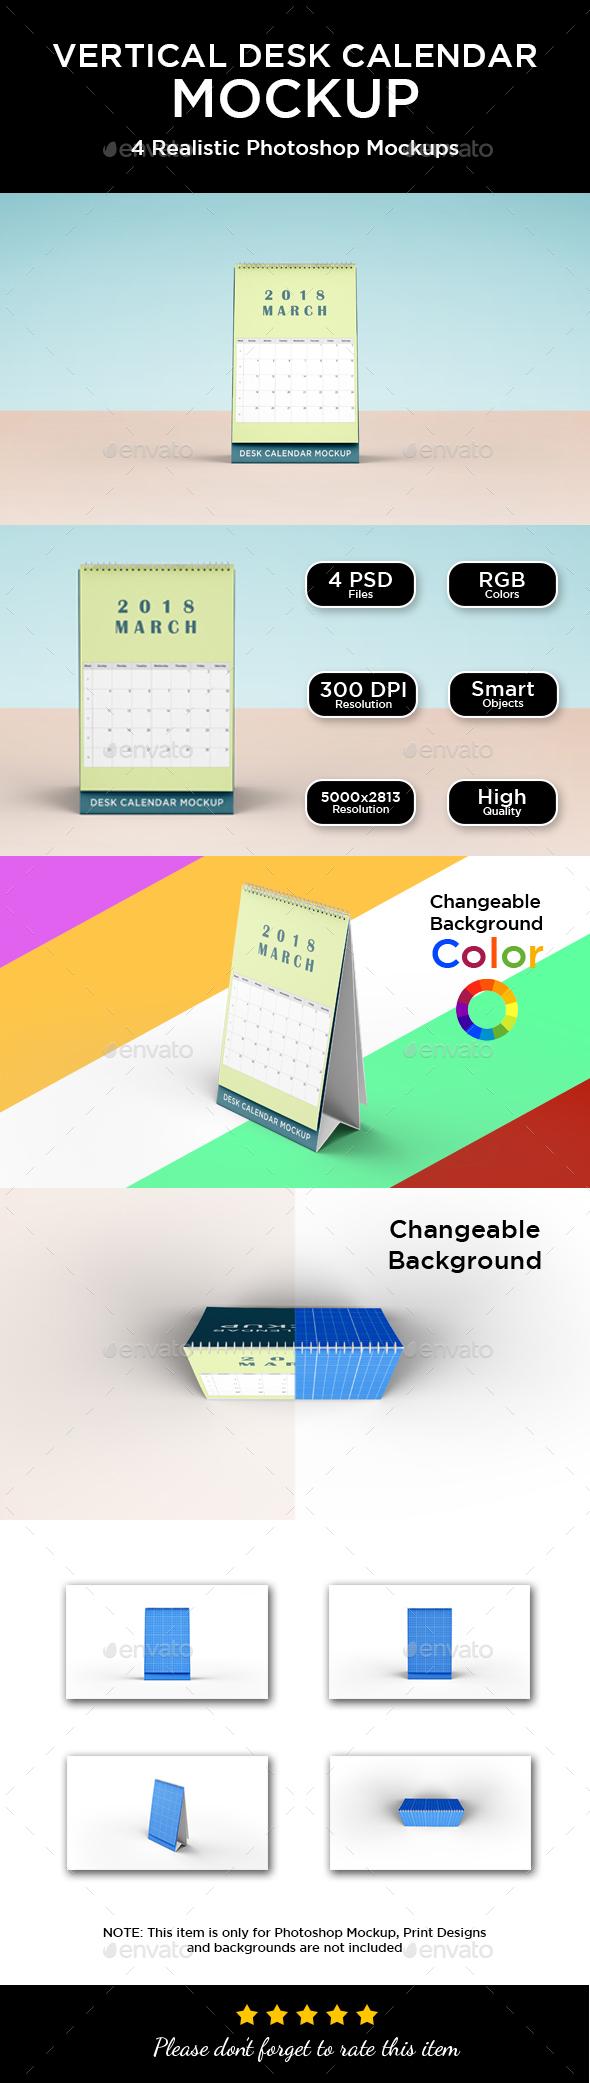 Vertical Desk Calendar Mockup - Print Product Mock-Ups